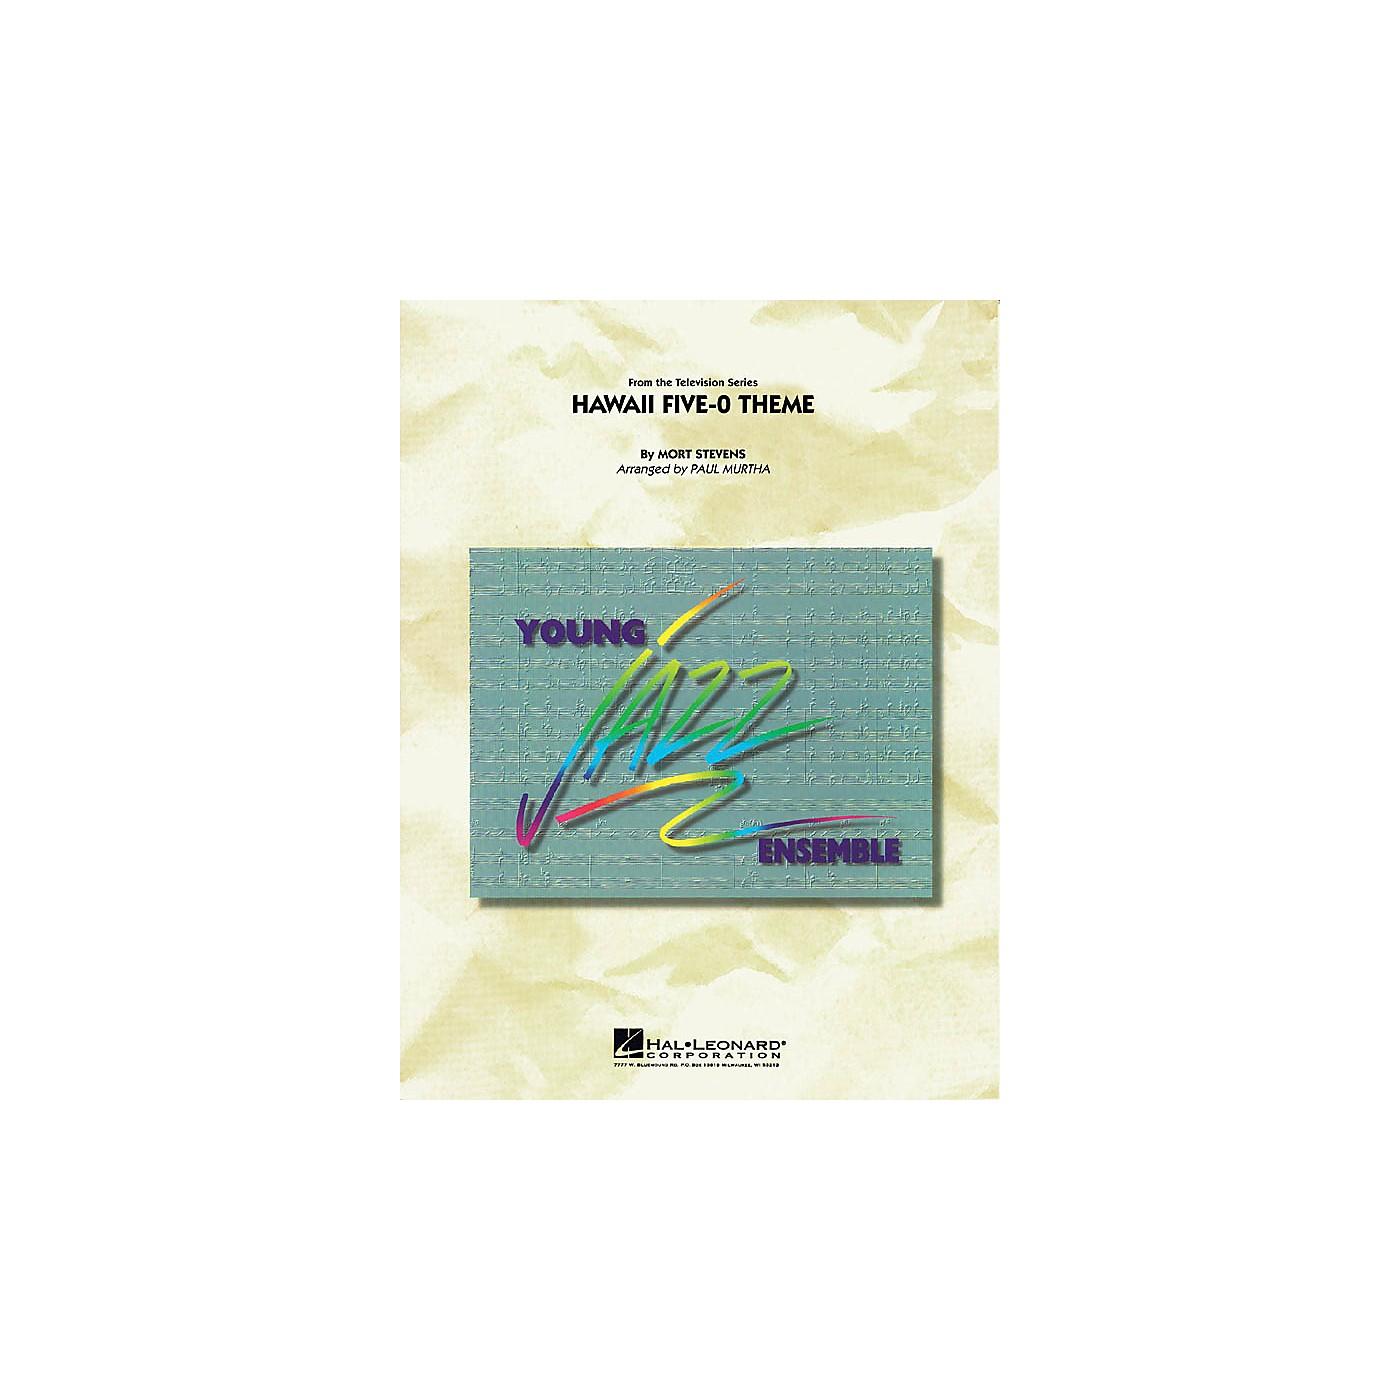 Hal Leonard Hawaii Five-O Theme Jazz Band Level 3 Arranged by Paul Murtha thumbnail